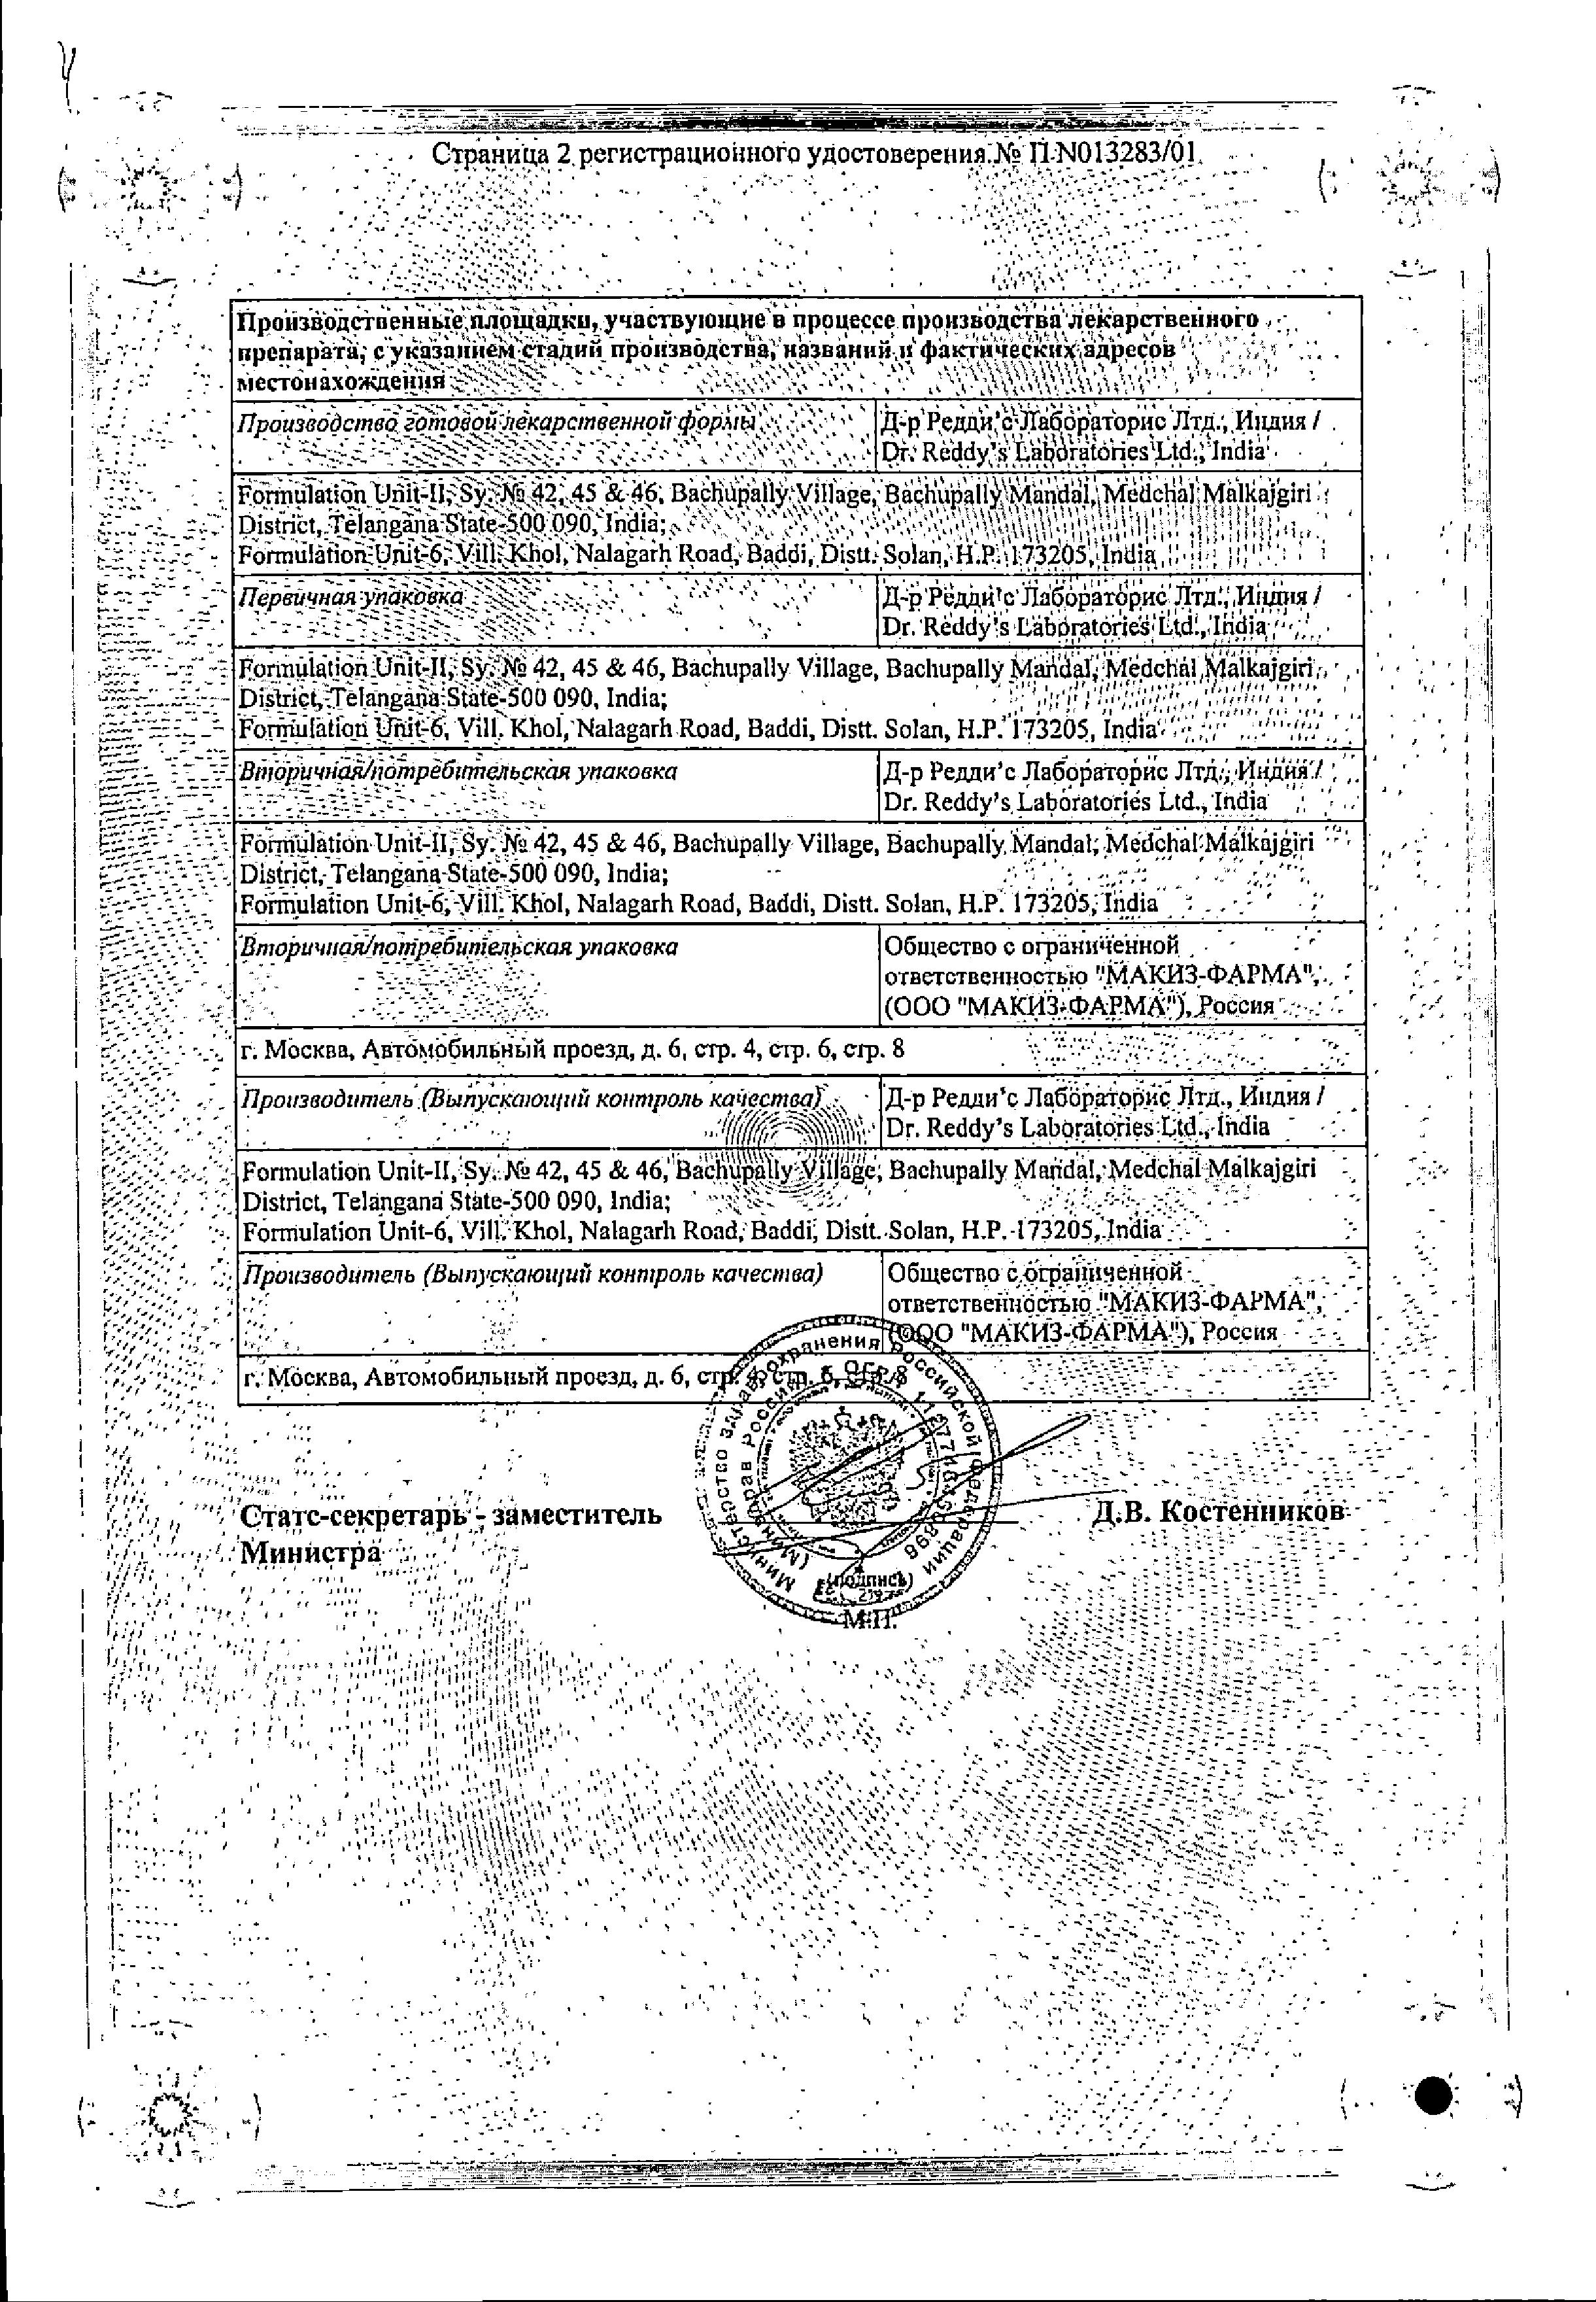 Цетрин сертификат